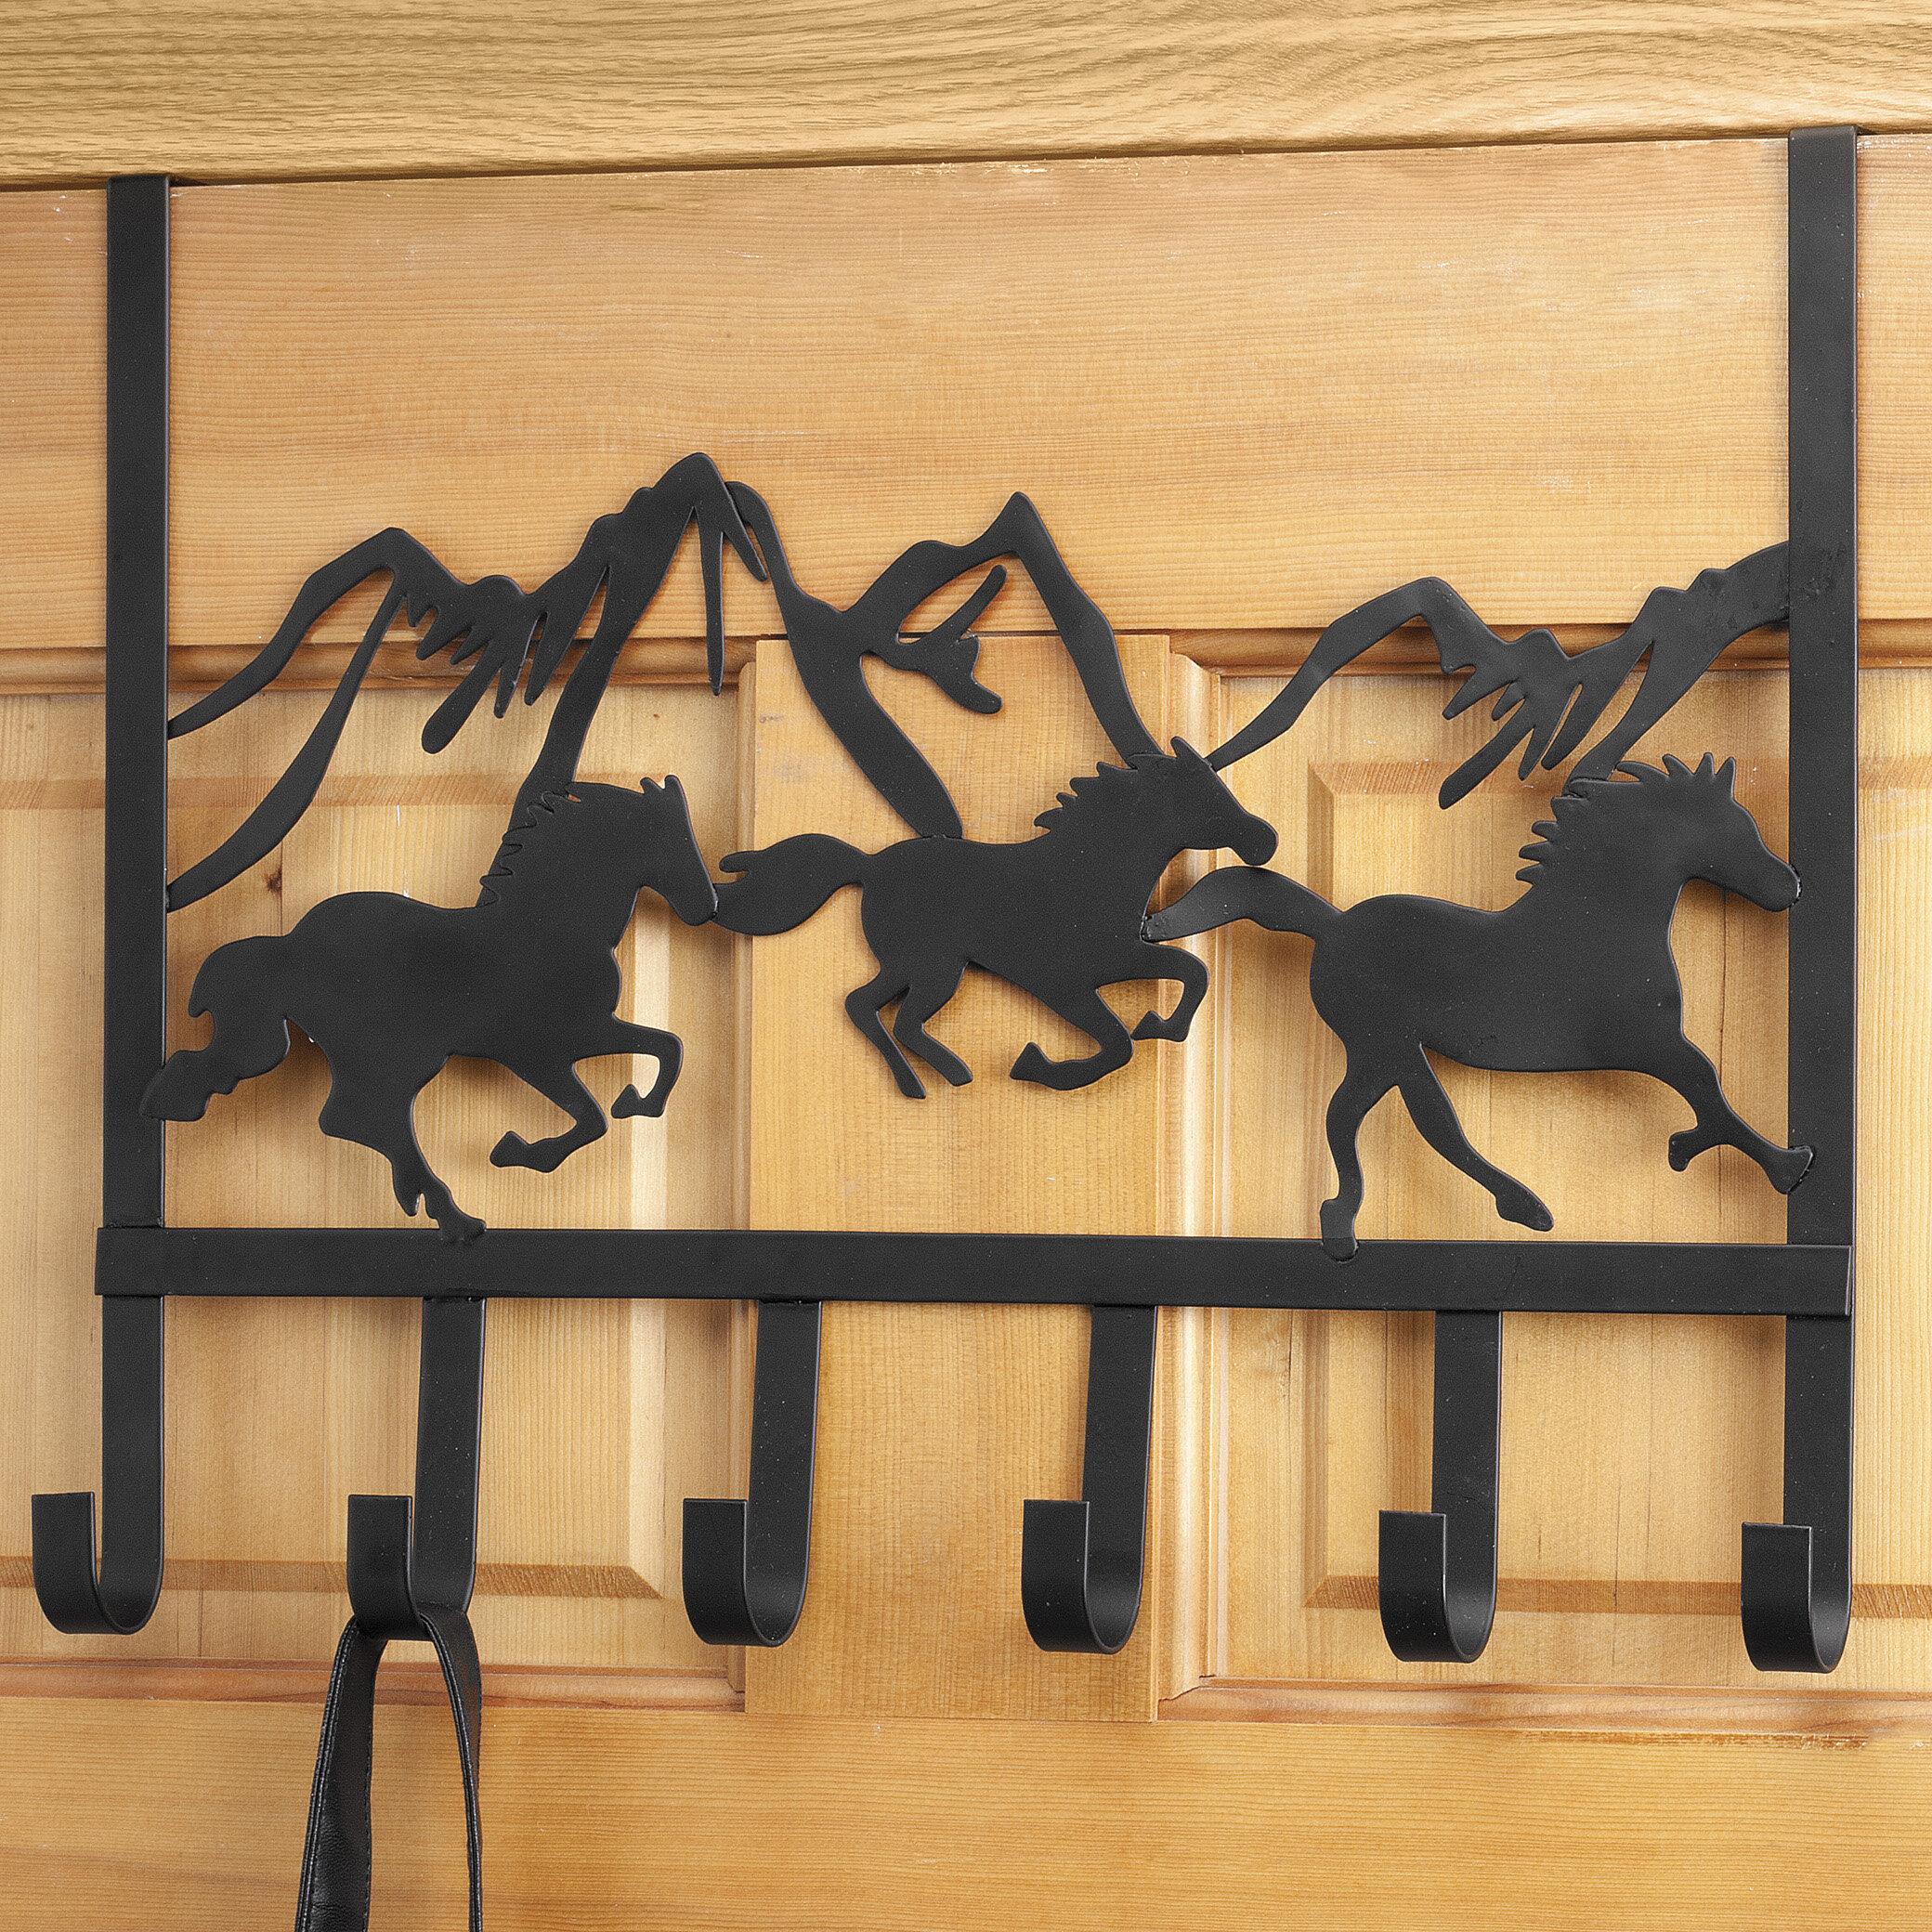 Best Wall Art Coat Hooks Gallery - The Wall Art Decorations ...